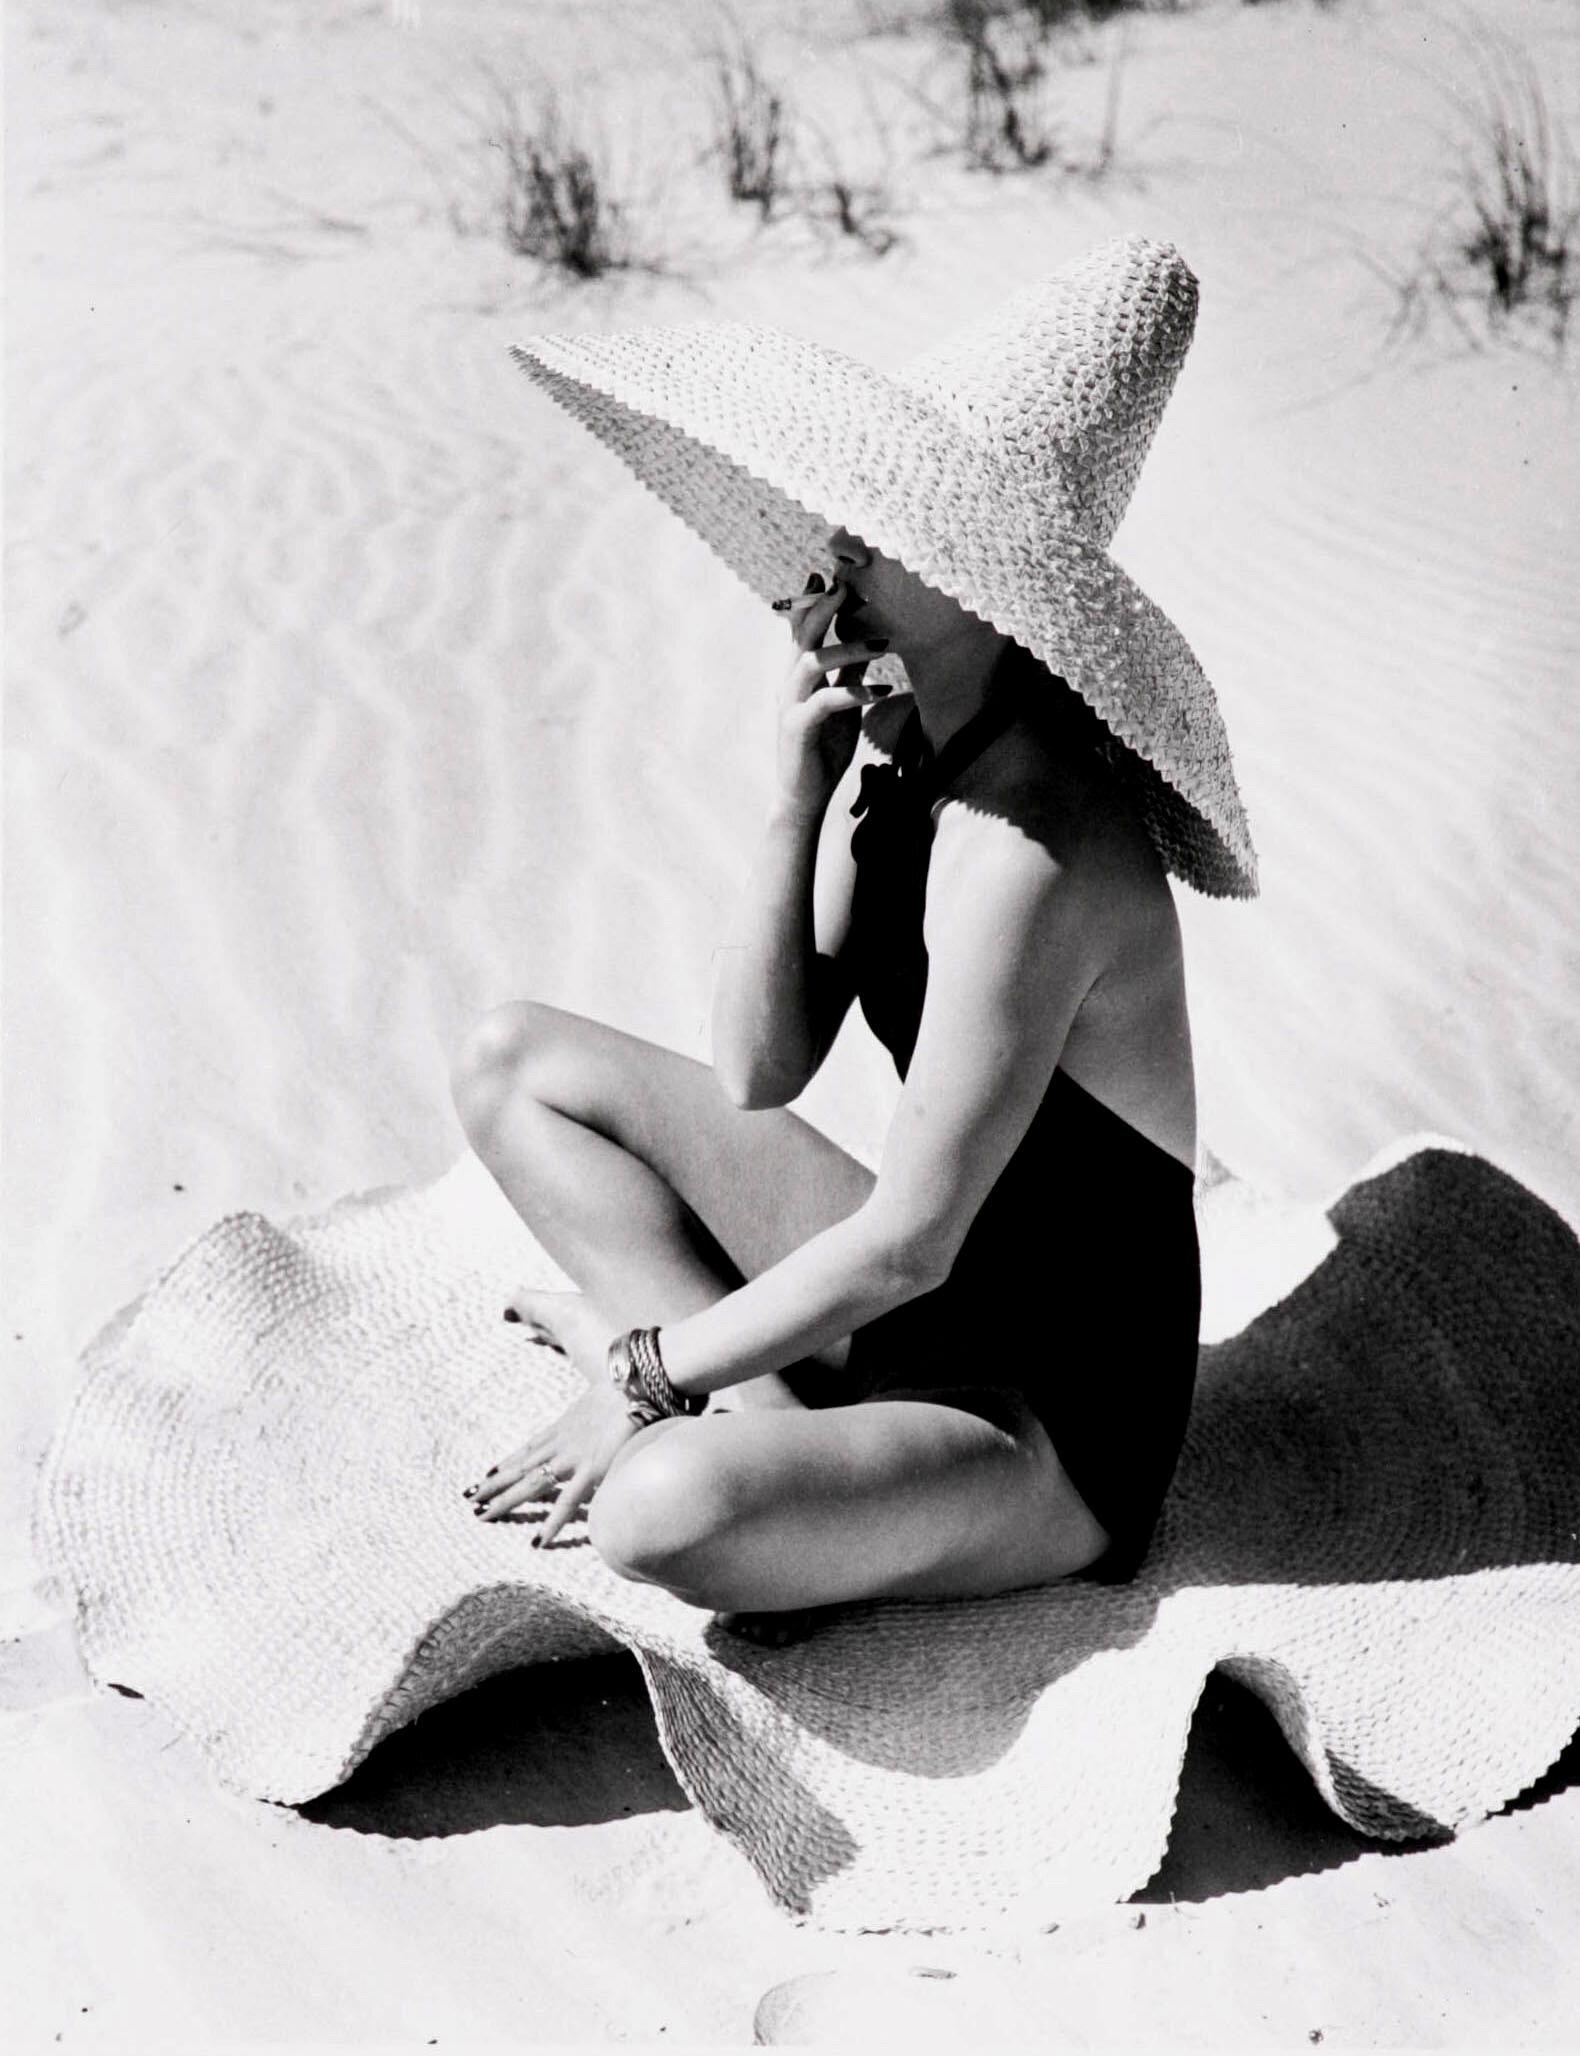 fernand fonssagrives mexican extravaganza 1949 lisa.jpg